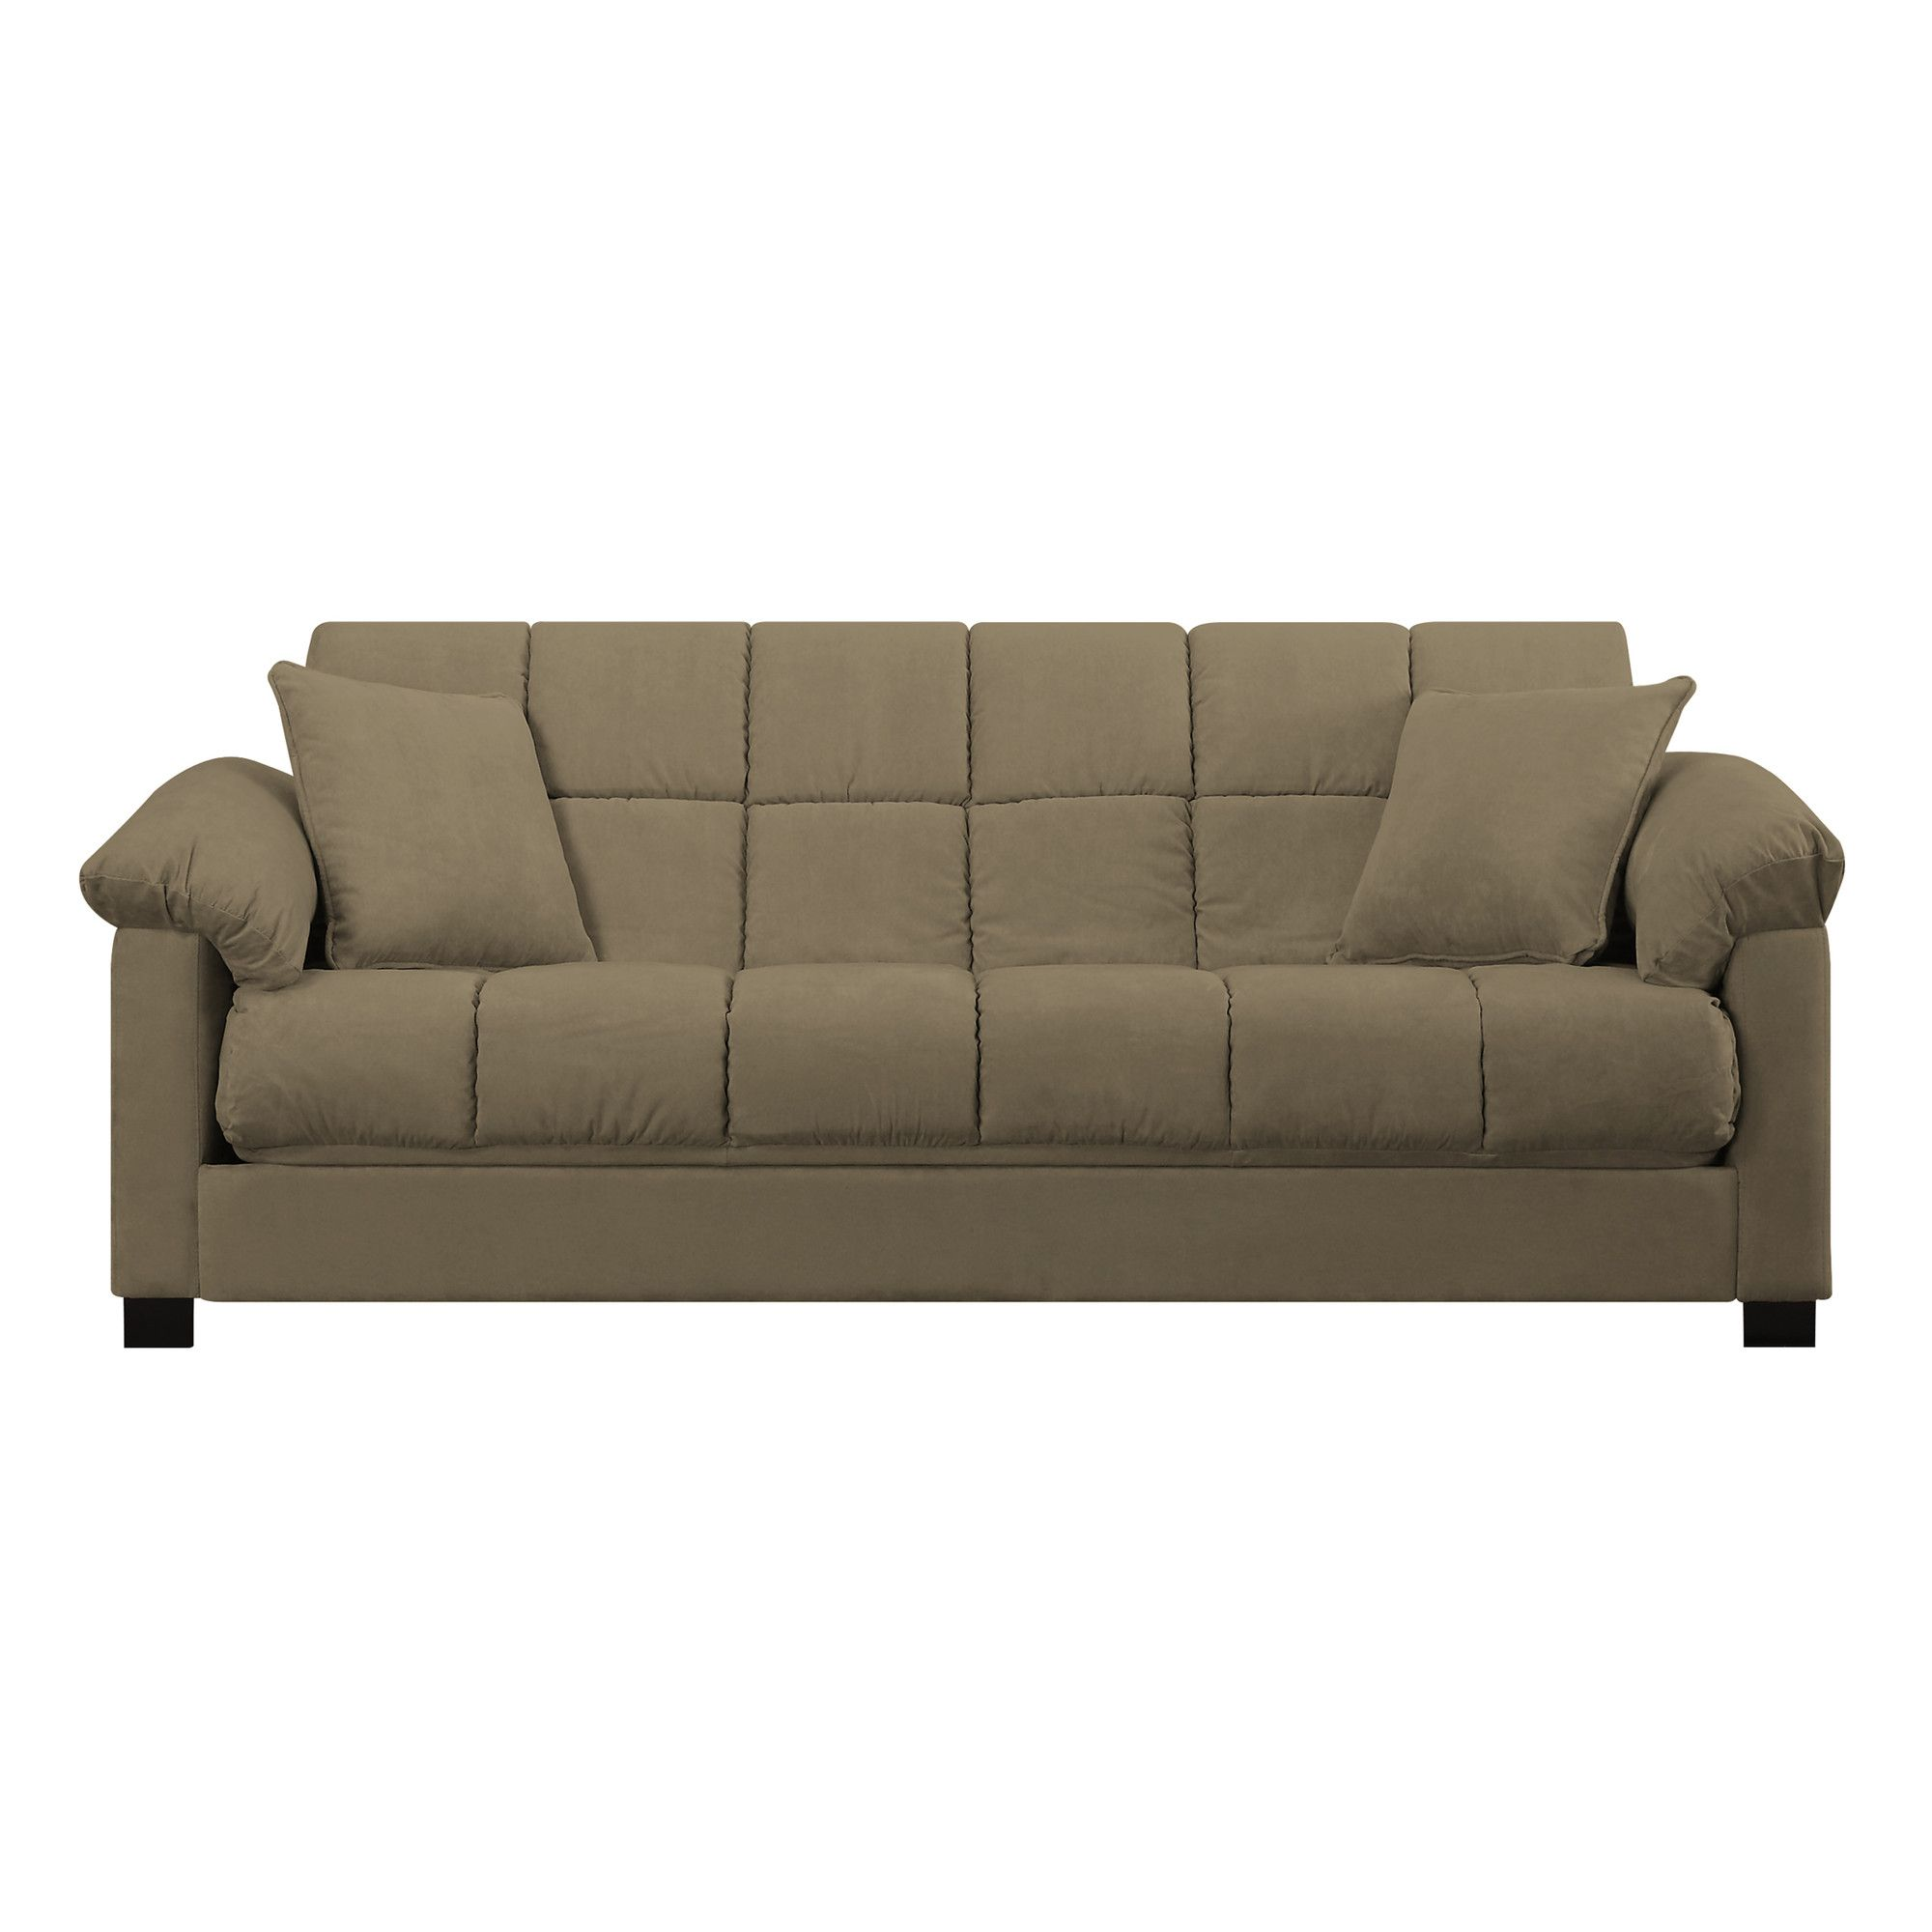 Handy Living Convert A Couch Sleeper Sofa Allmodern Couch